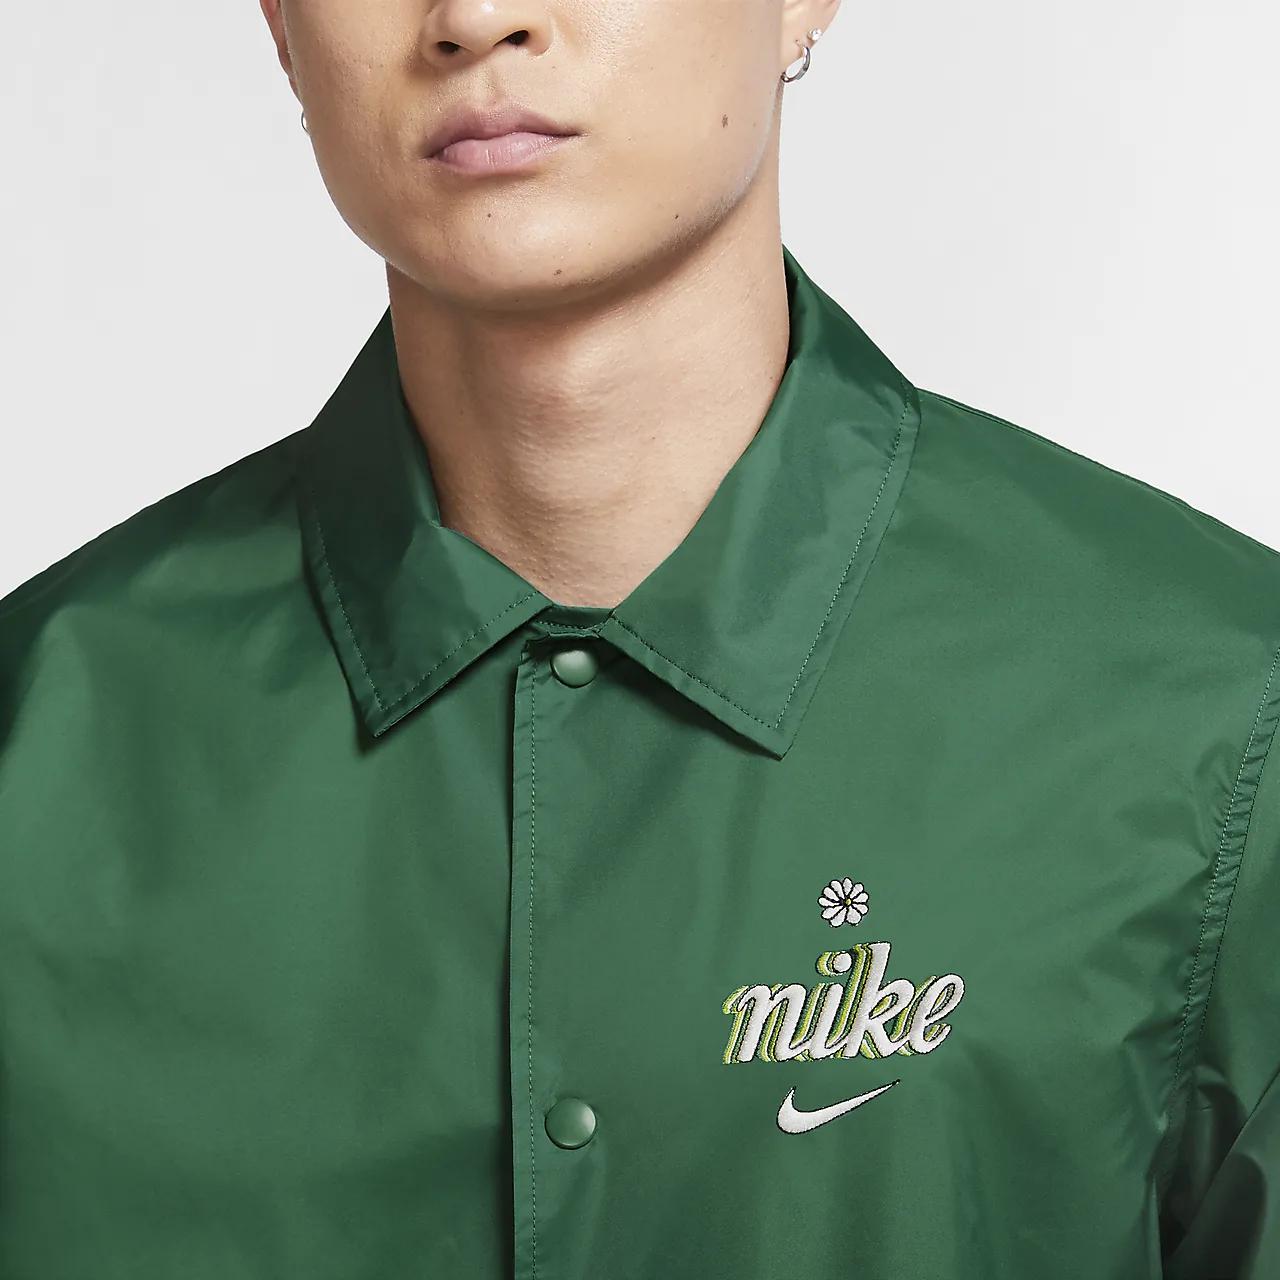 Nike Sportswear Men's Woven Coaches Jacket CZ9007-361